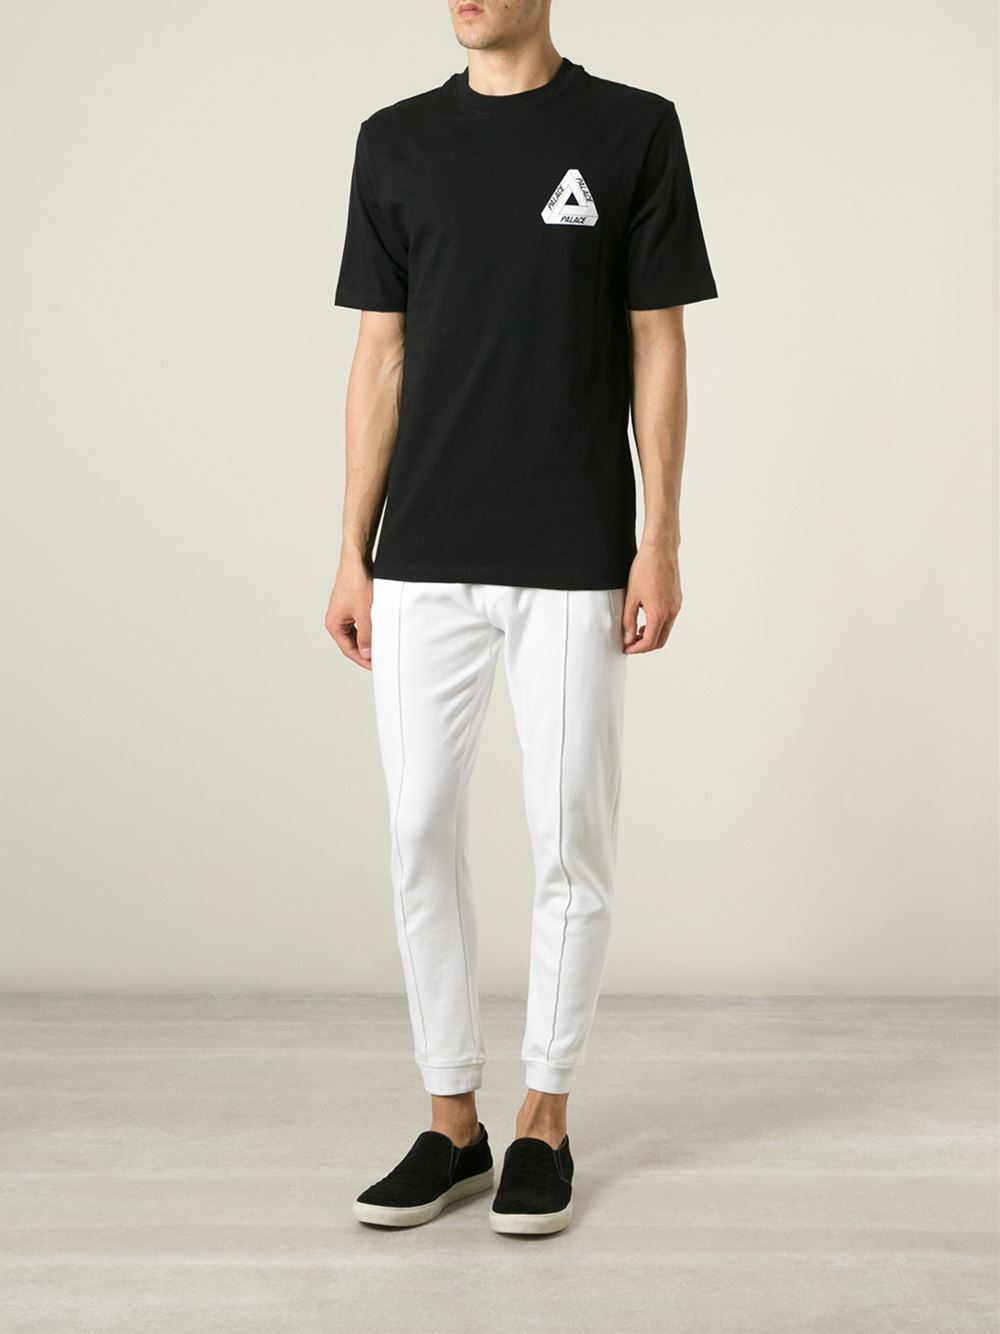 Cheap Versace Shirts For Men